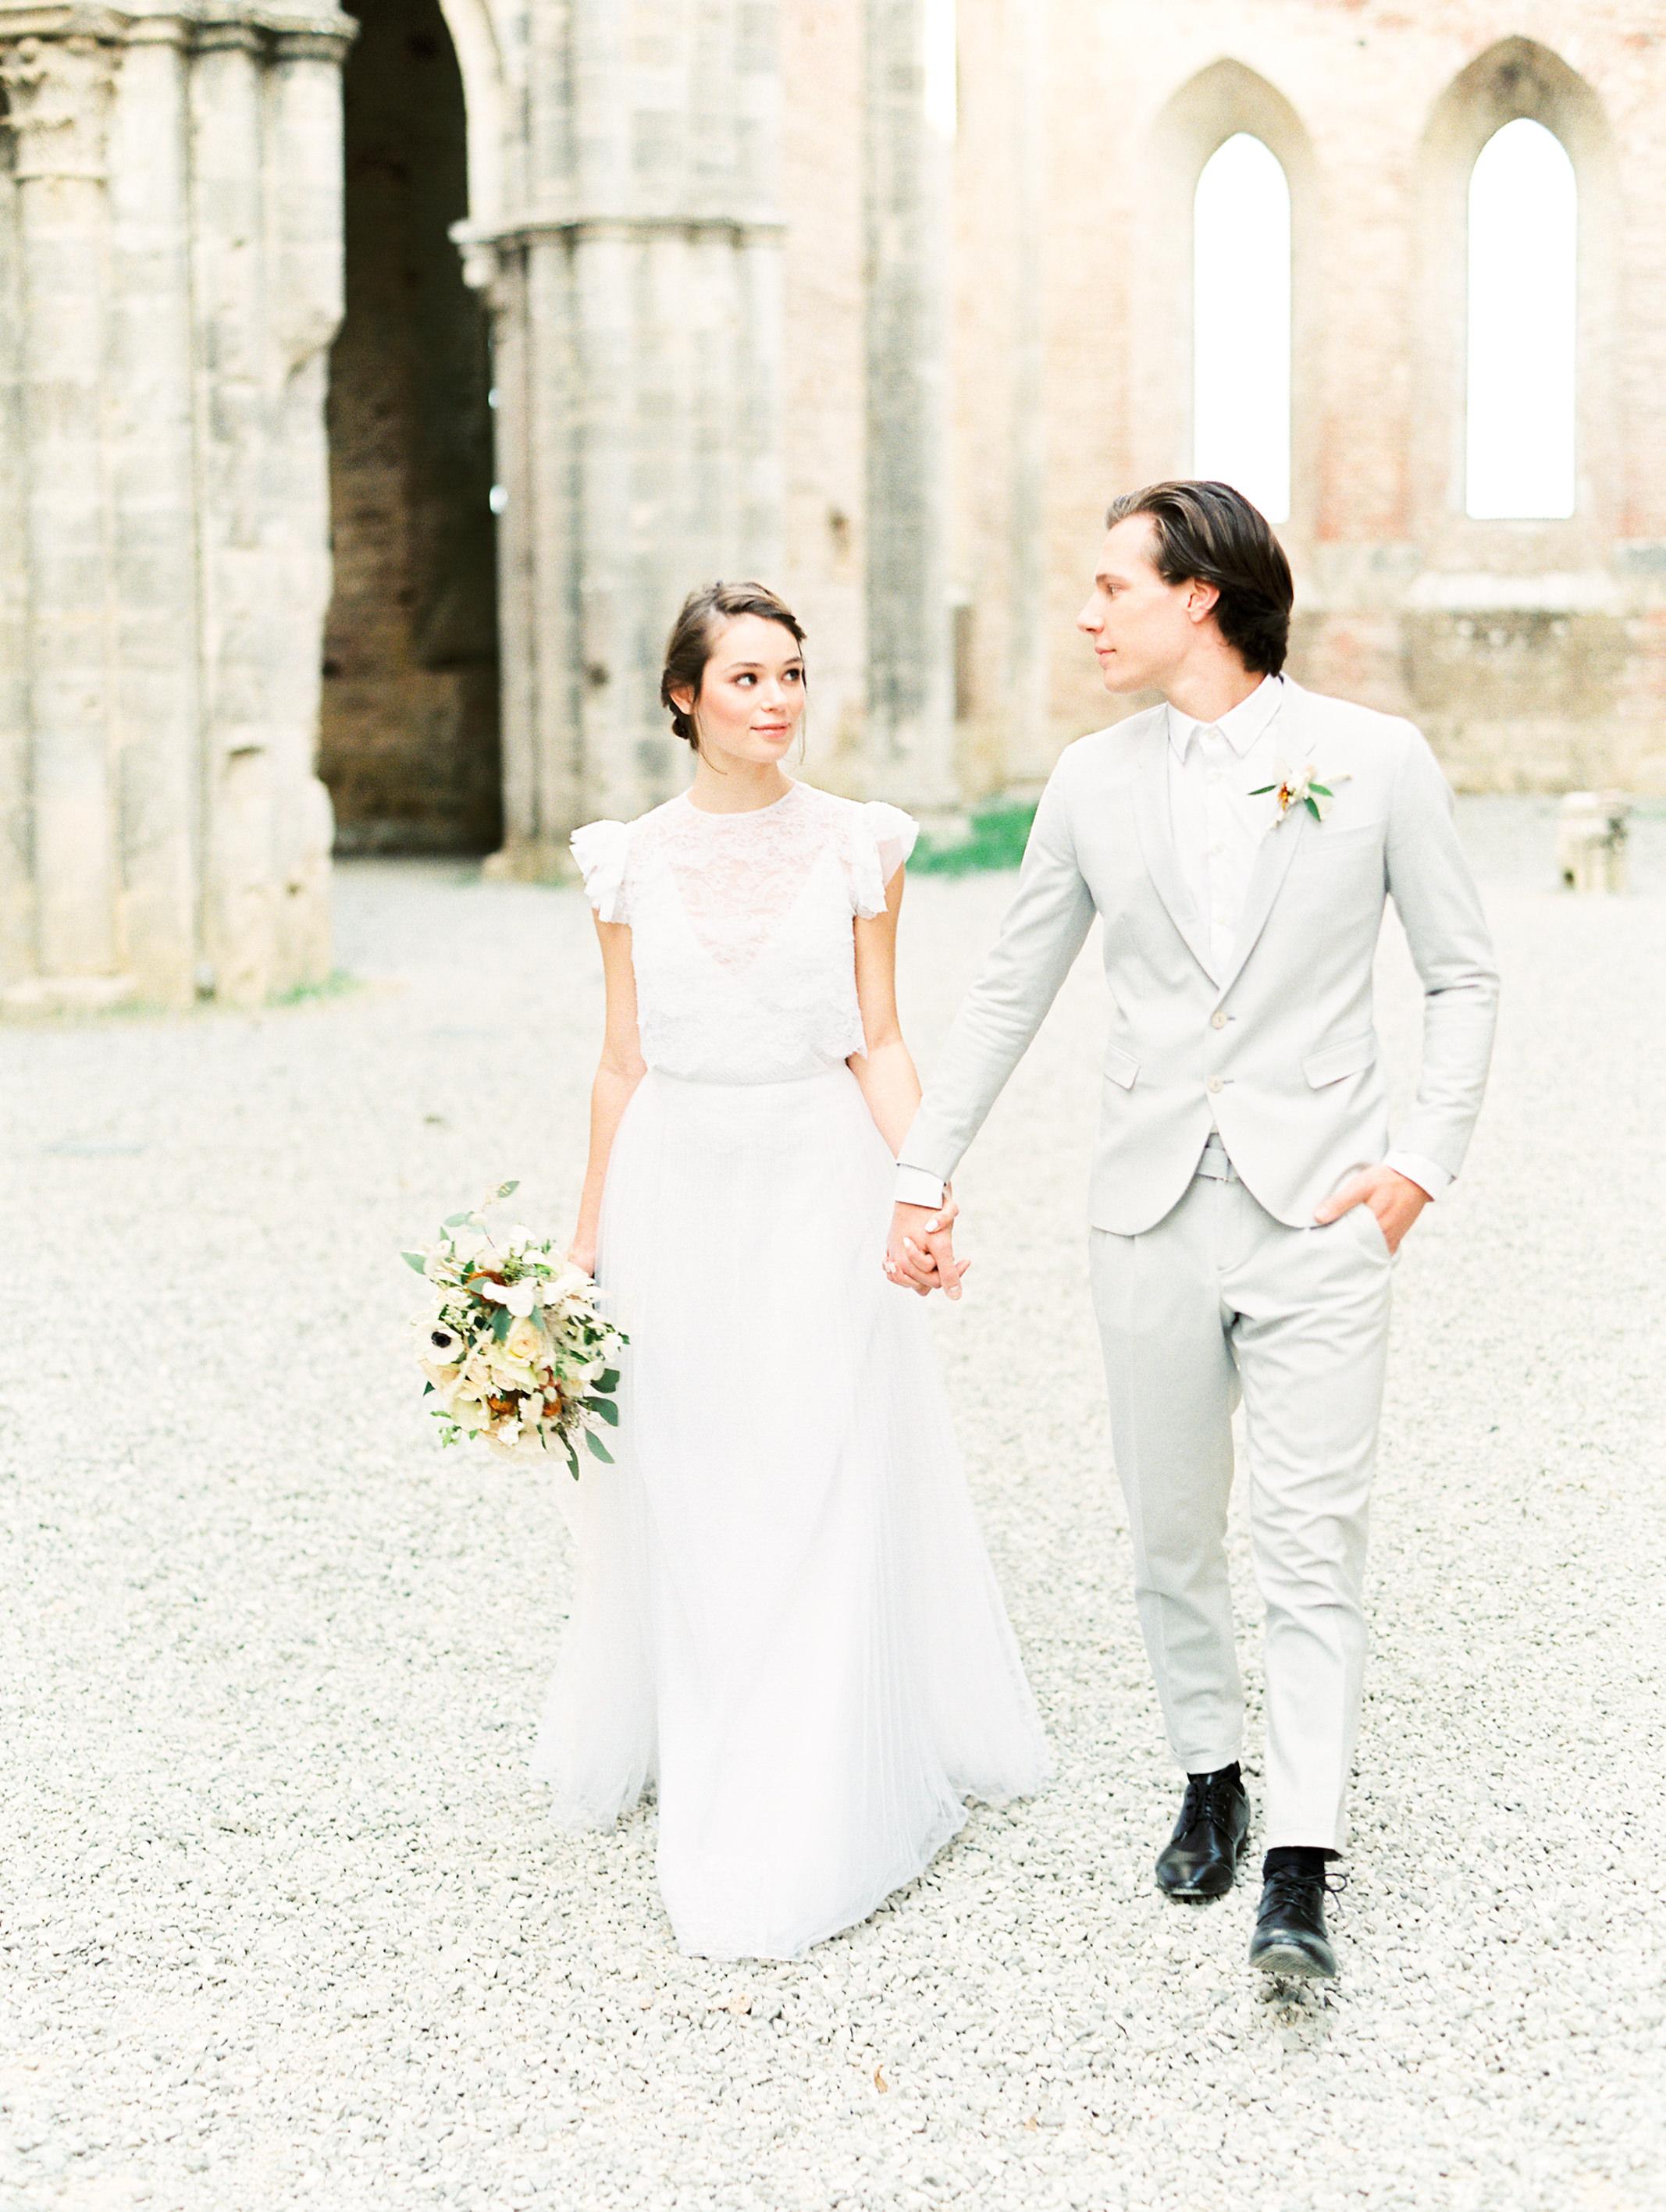 romantic-italy-wedding-in-tuscany-19.jpg